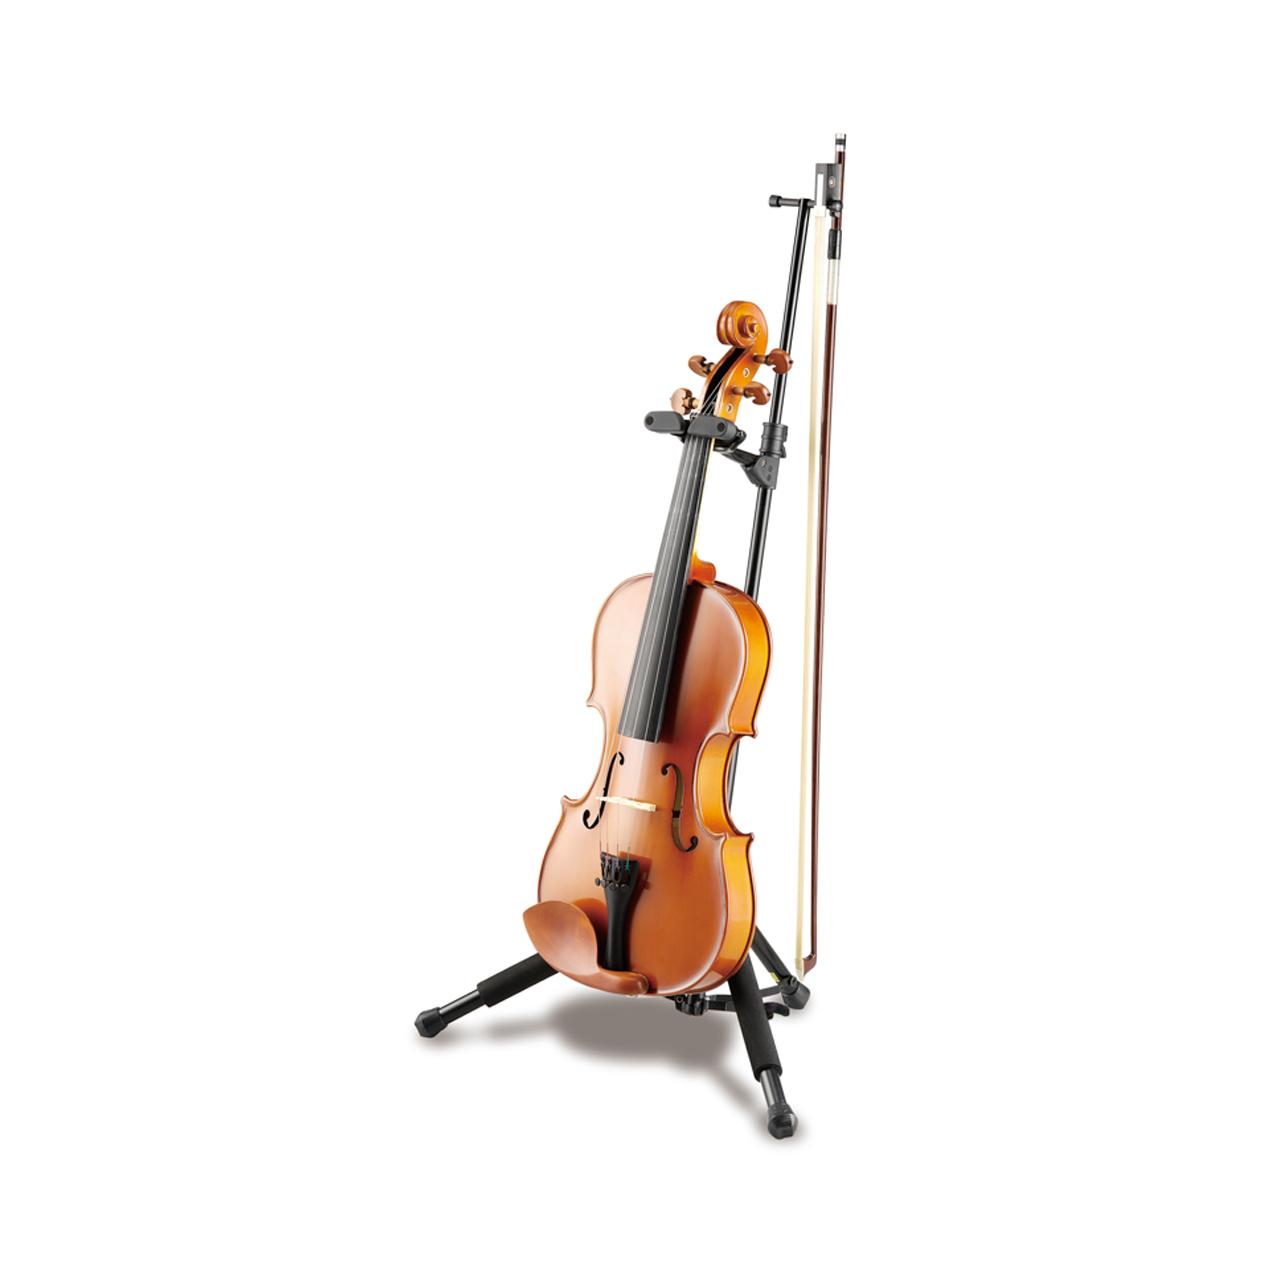 Suporte Travlite Aluminio P/violino/viola Ds571bb Hercules  - Audio Video & cia